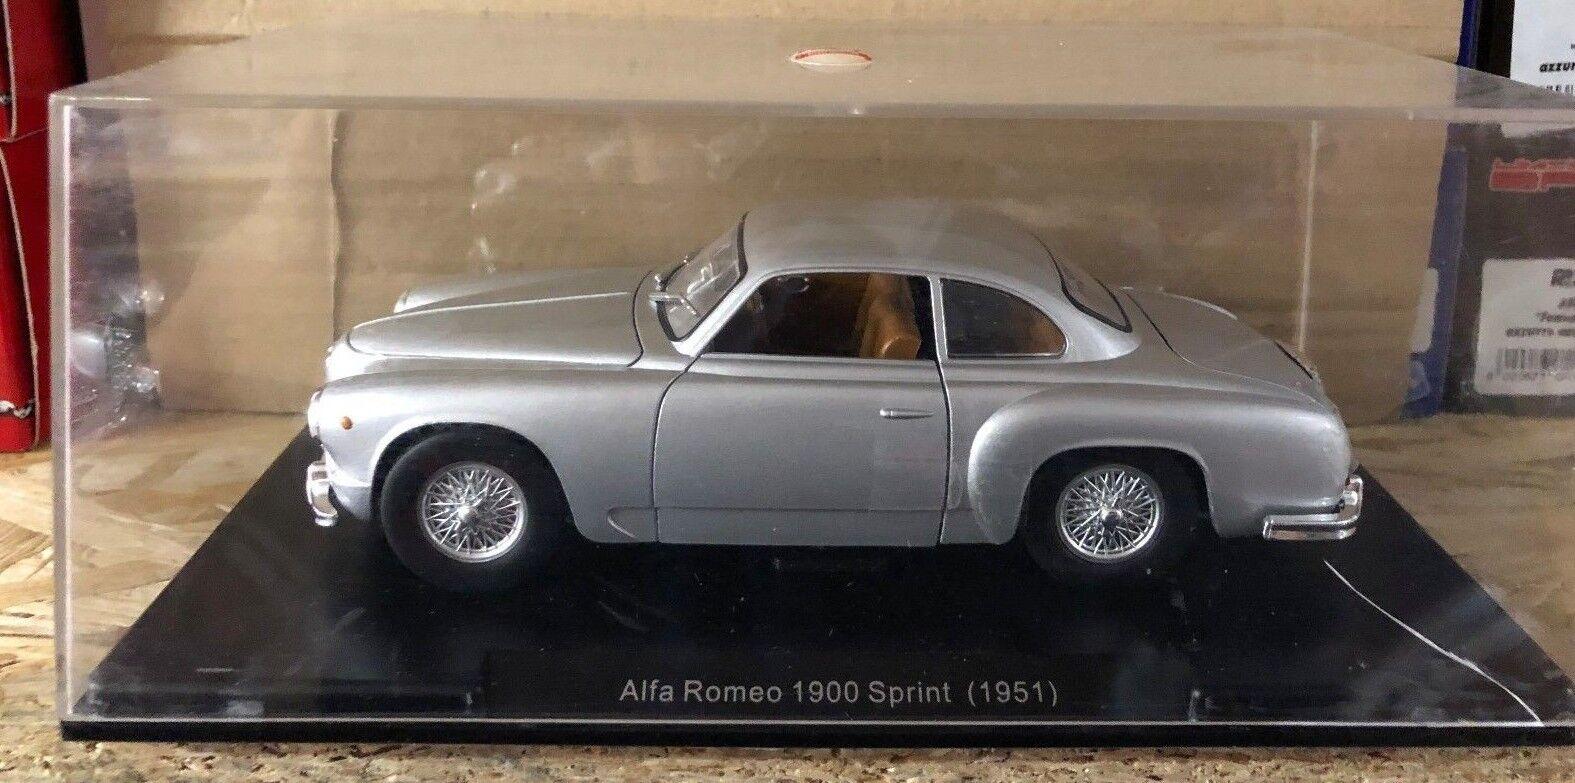 Druckguss  alfa romeo 1900 sprint (1951) und  maßstab 1   24 pkw - oldtimer